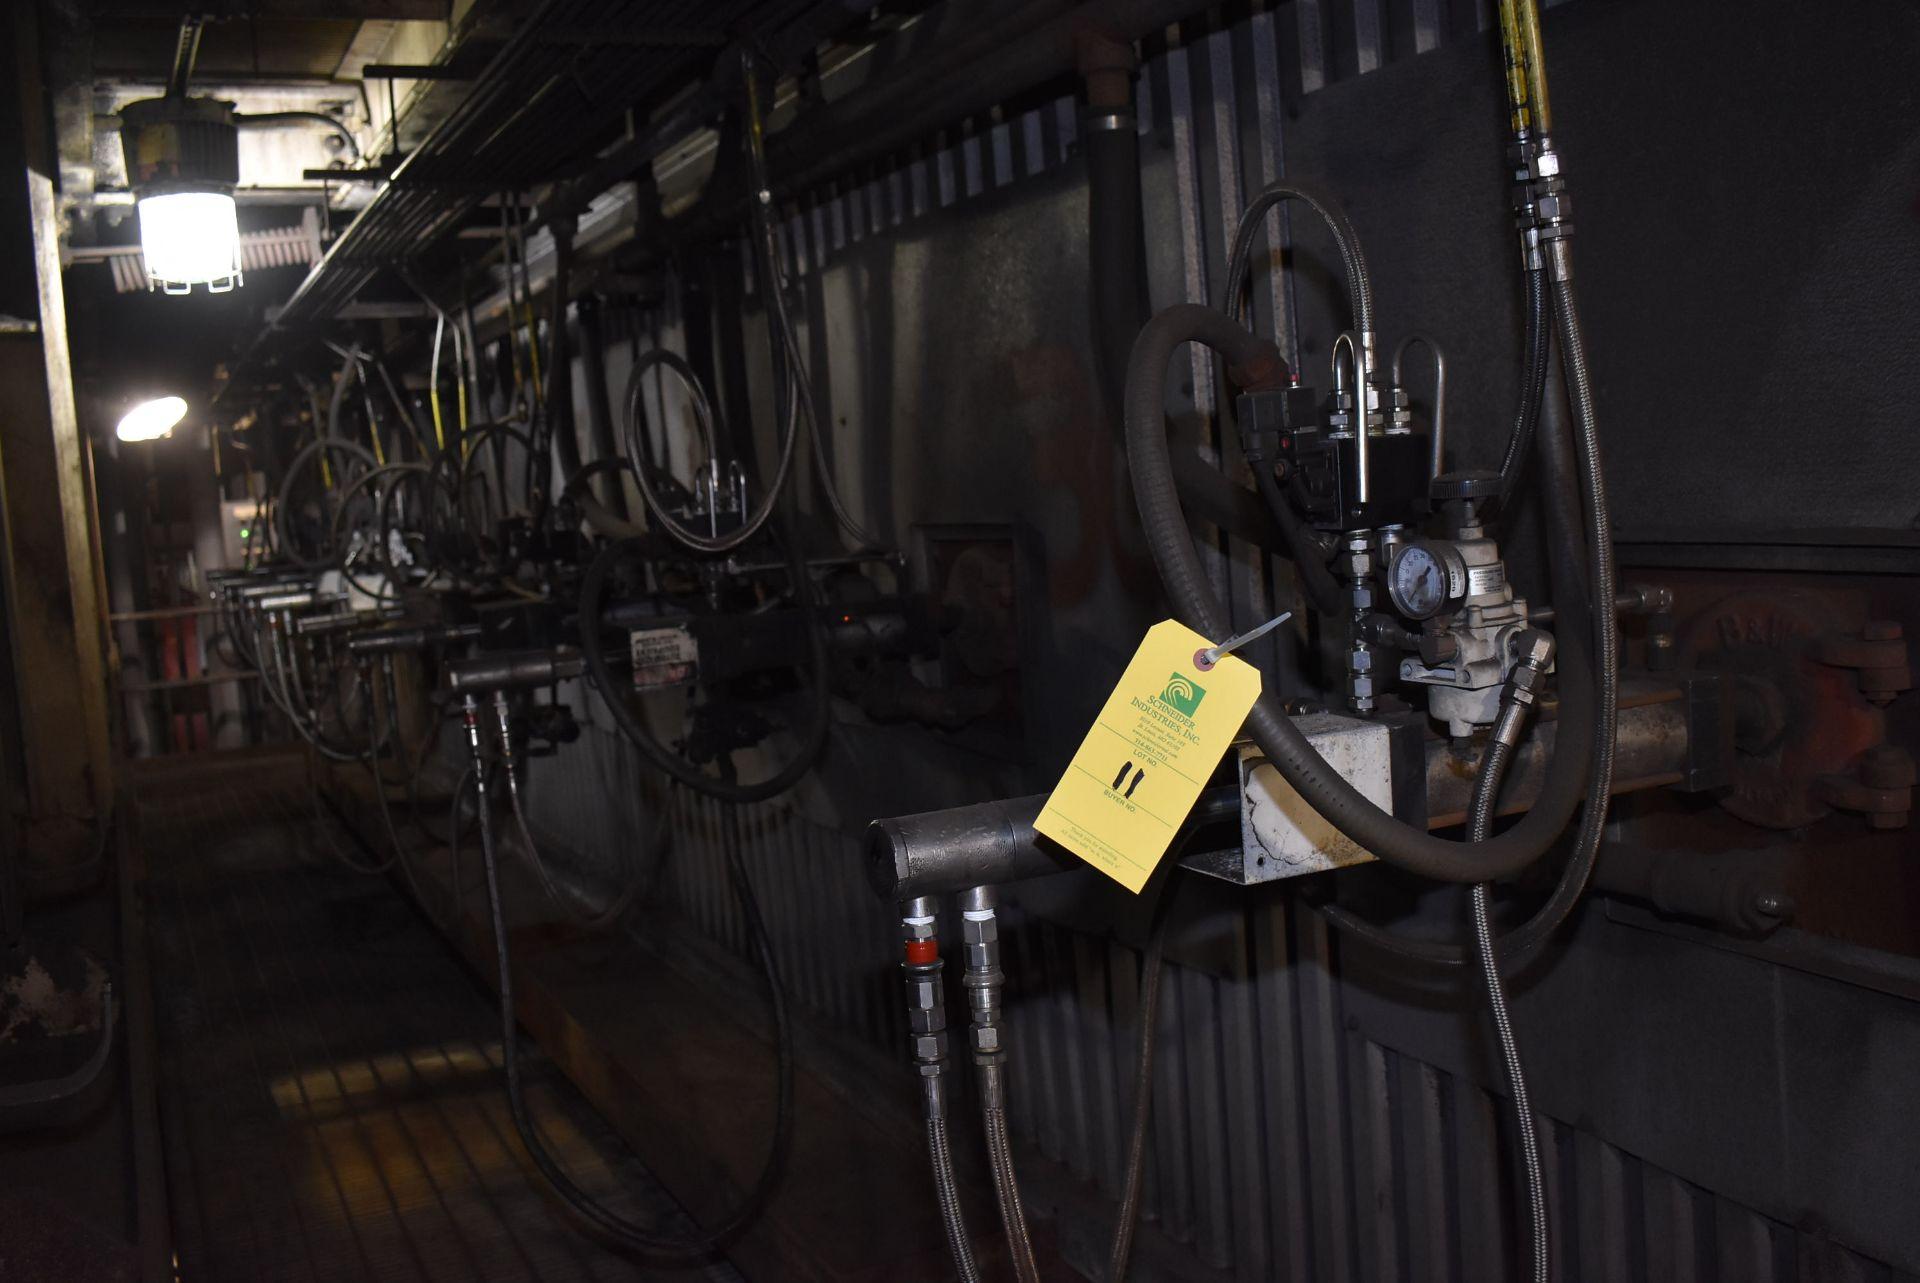 Lot 11 - (8) Nalco Fuel Tech Auto Retract Injectors